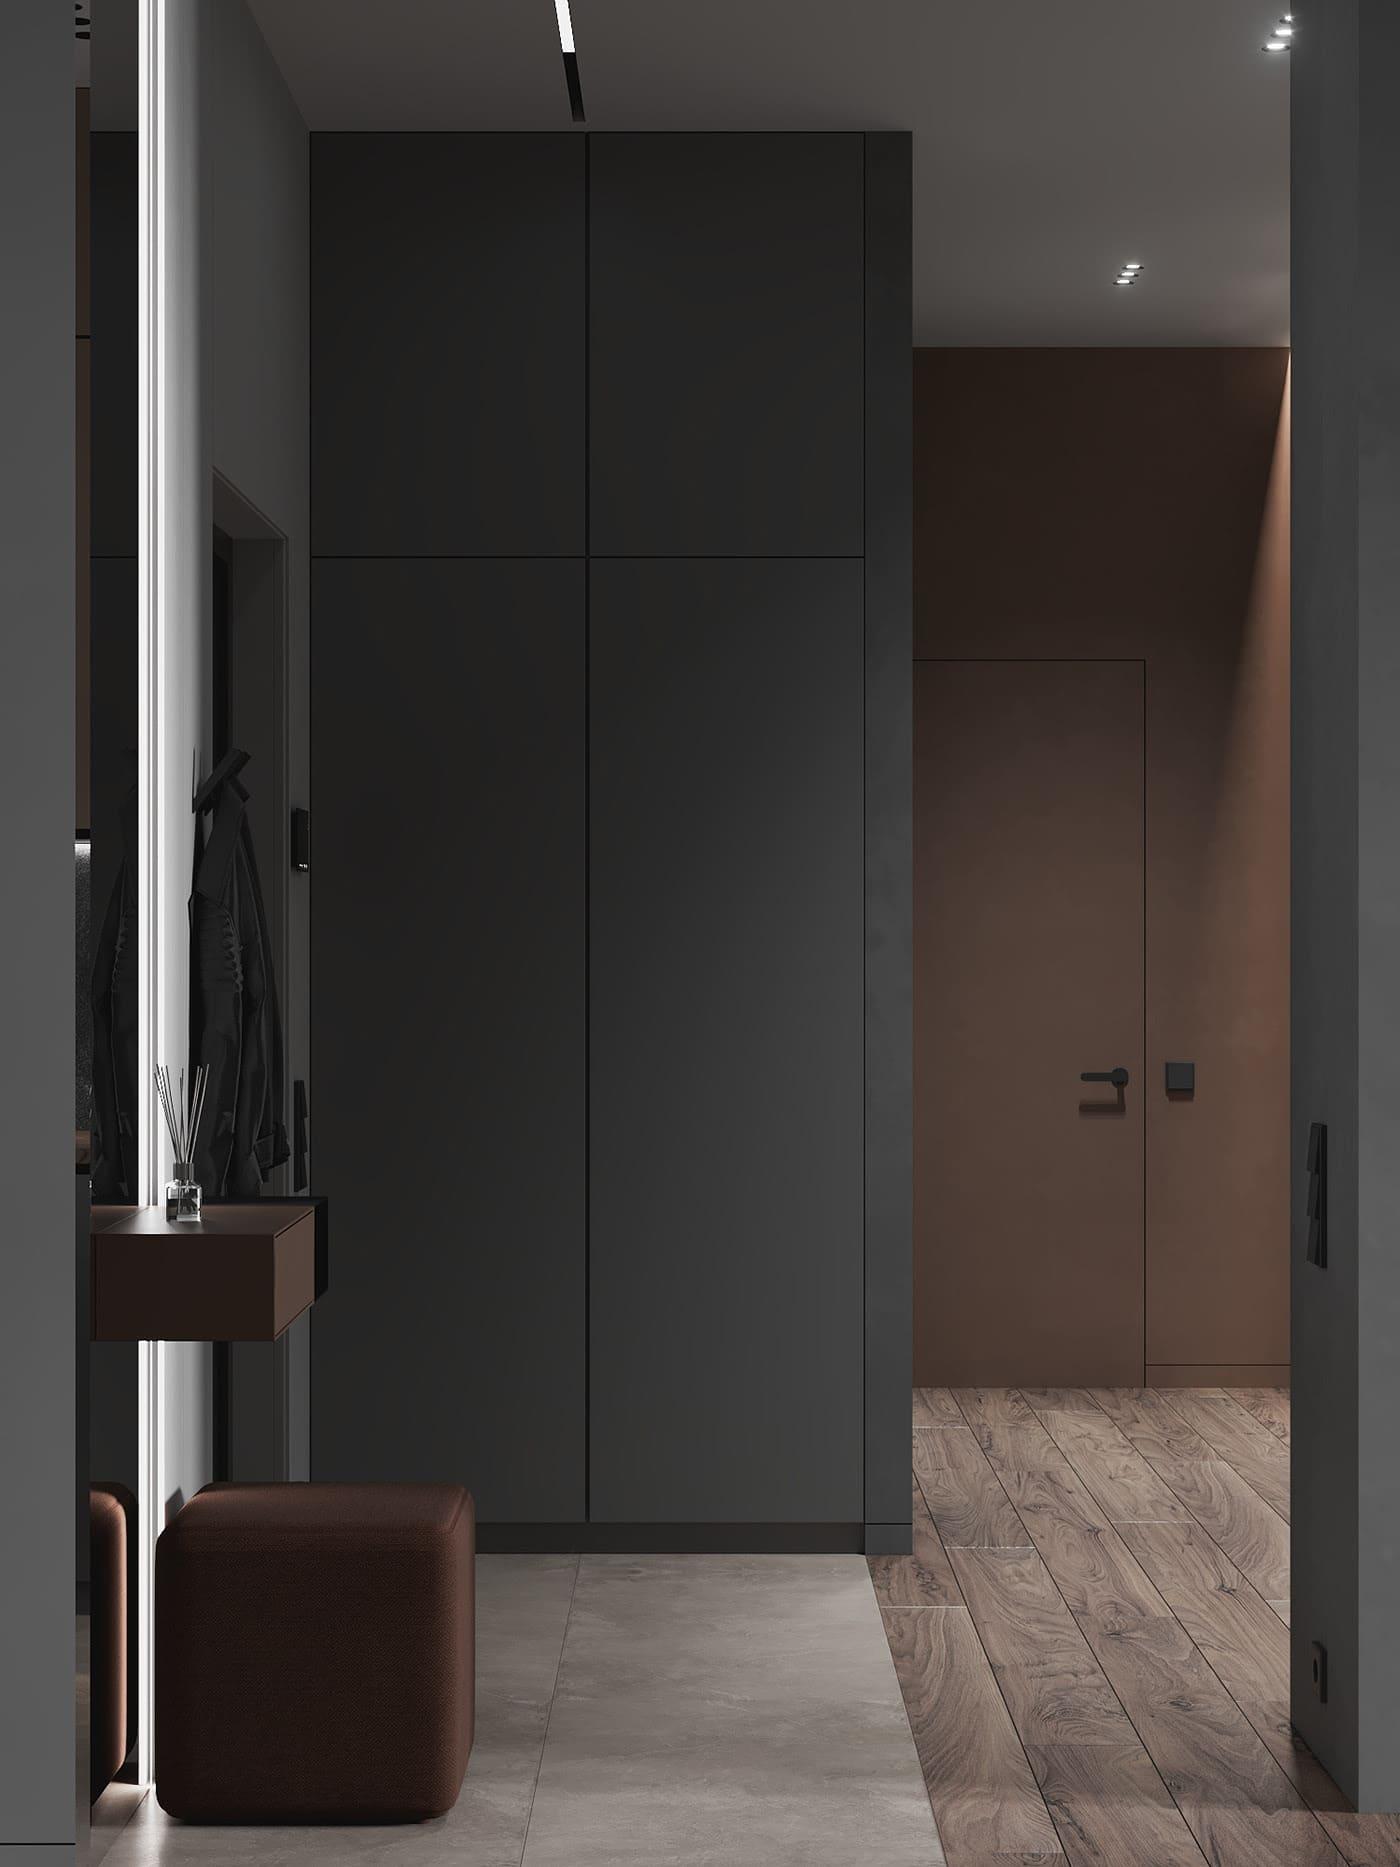 модный дизайн интерьера квартиры фото 1